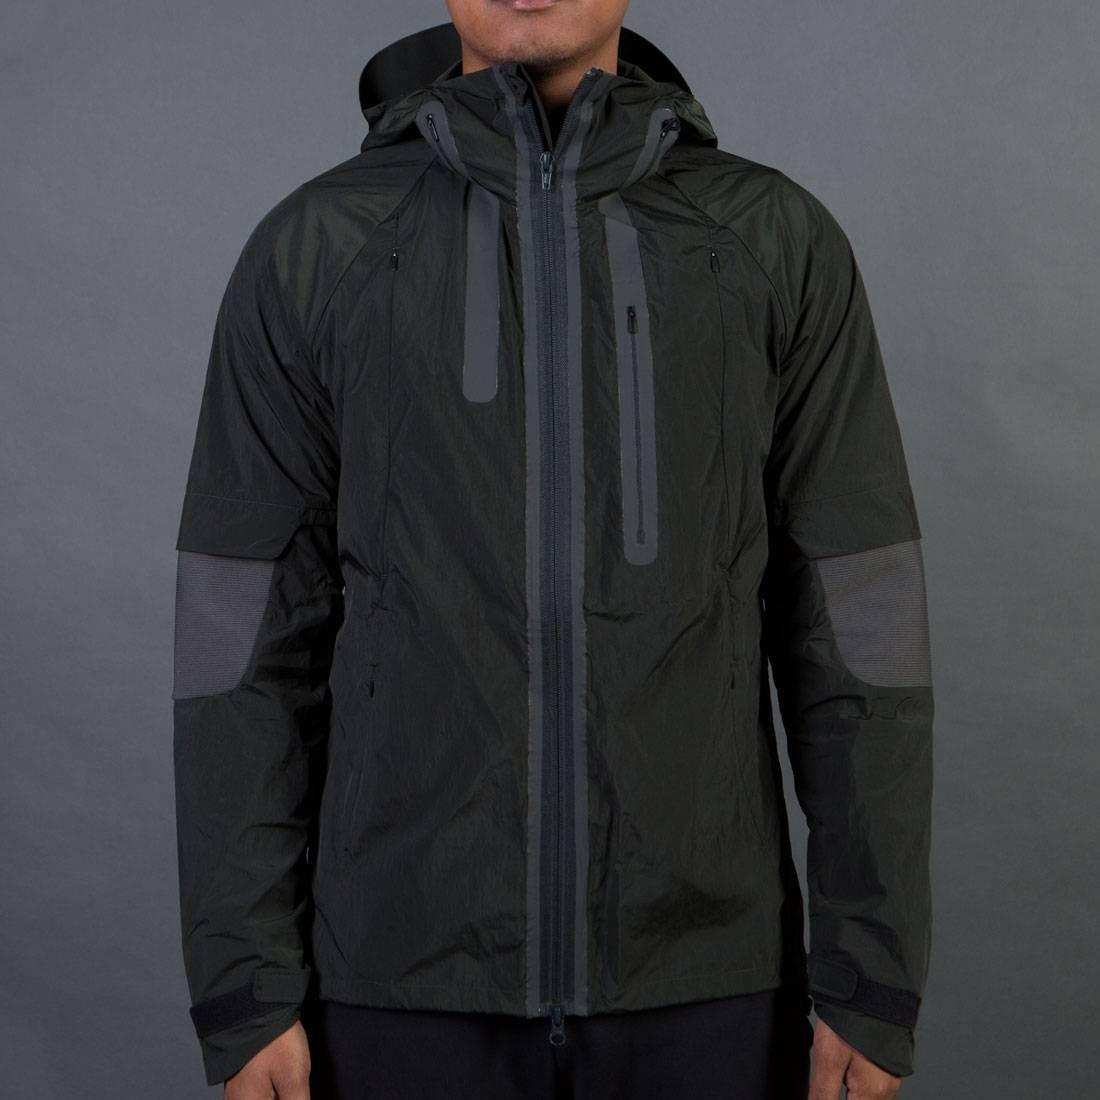 Adidas Y-3 Men Nylon Hood Jacket (olive / dark black olive)